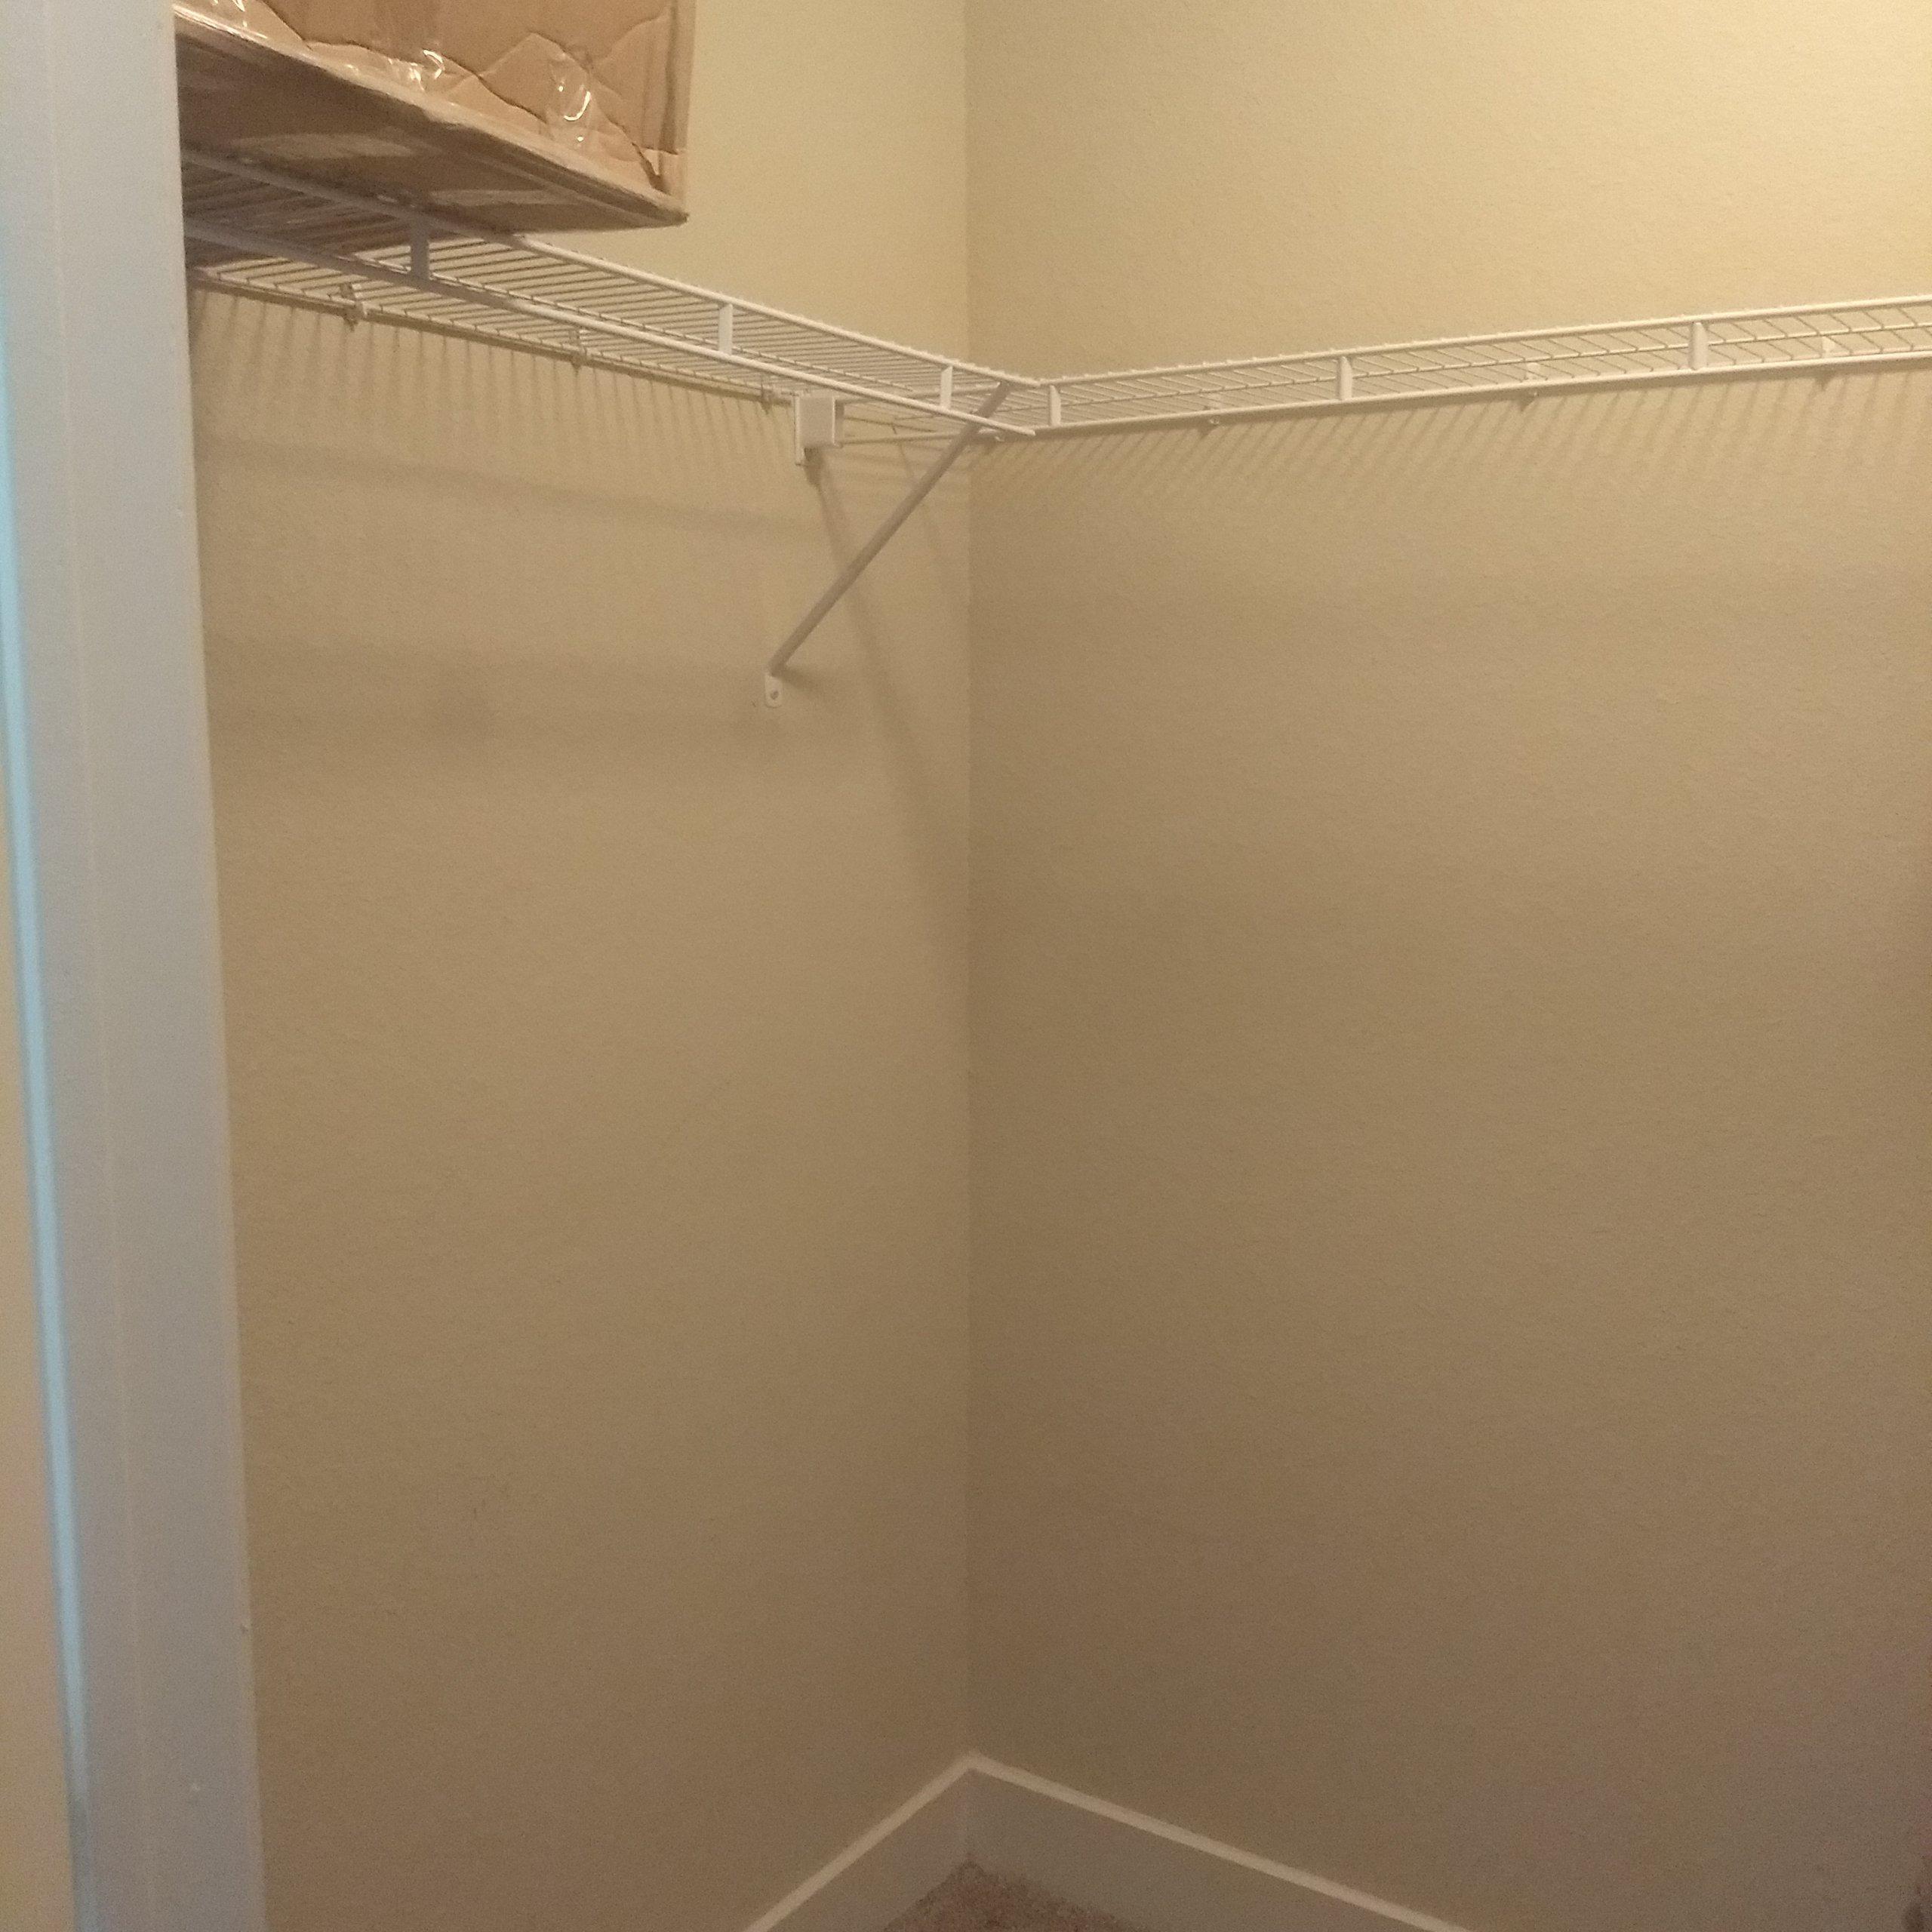 7x2 Closet self storage unit